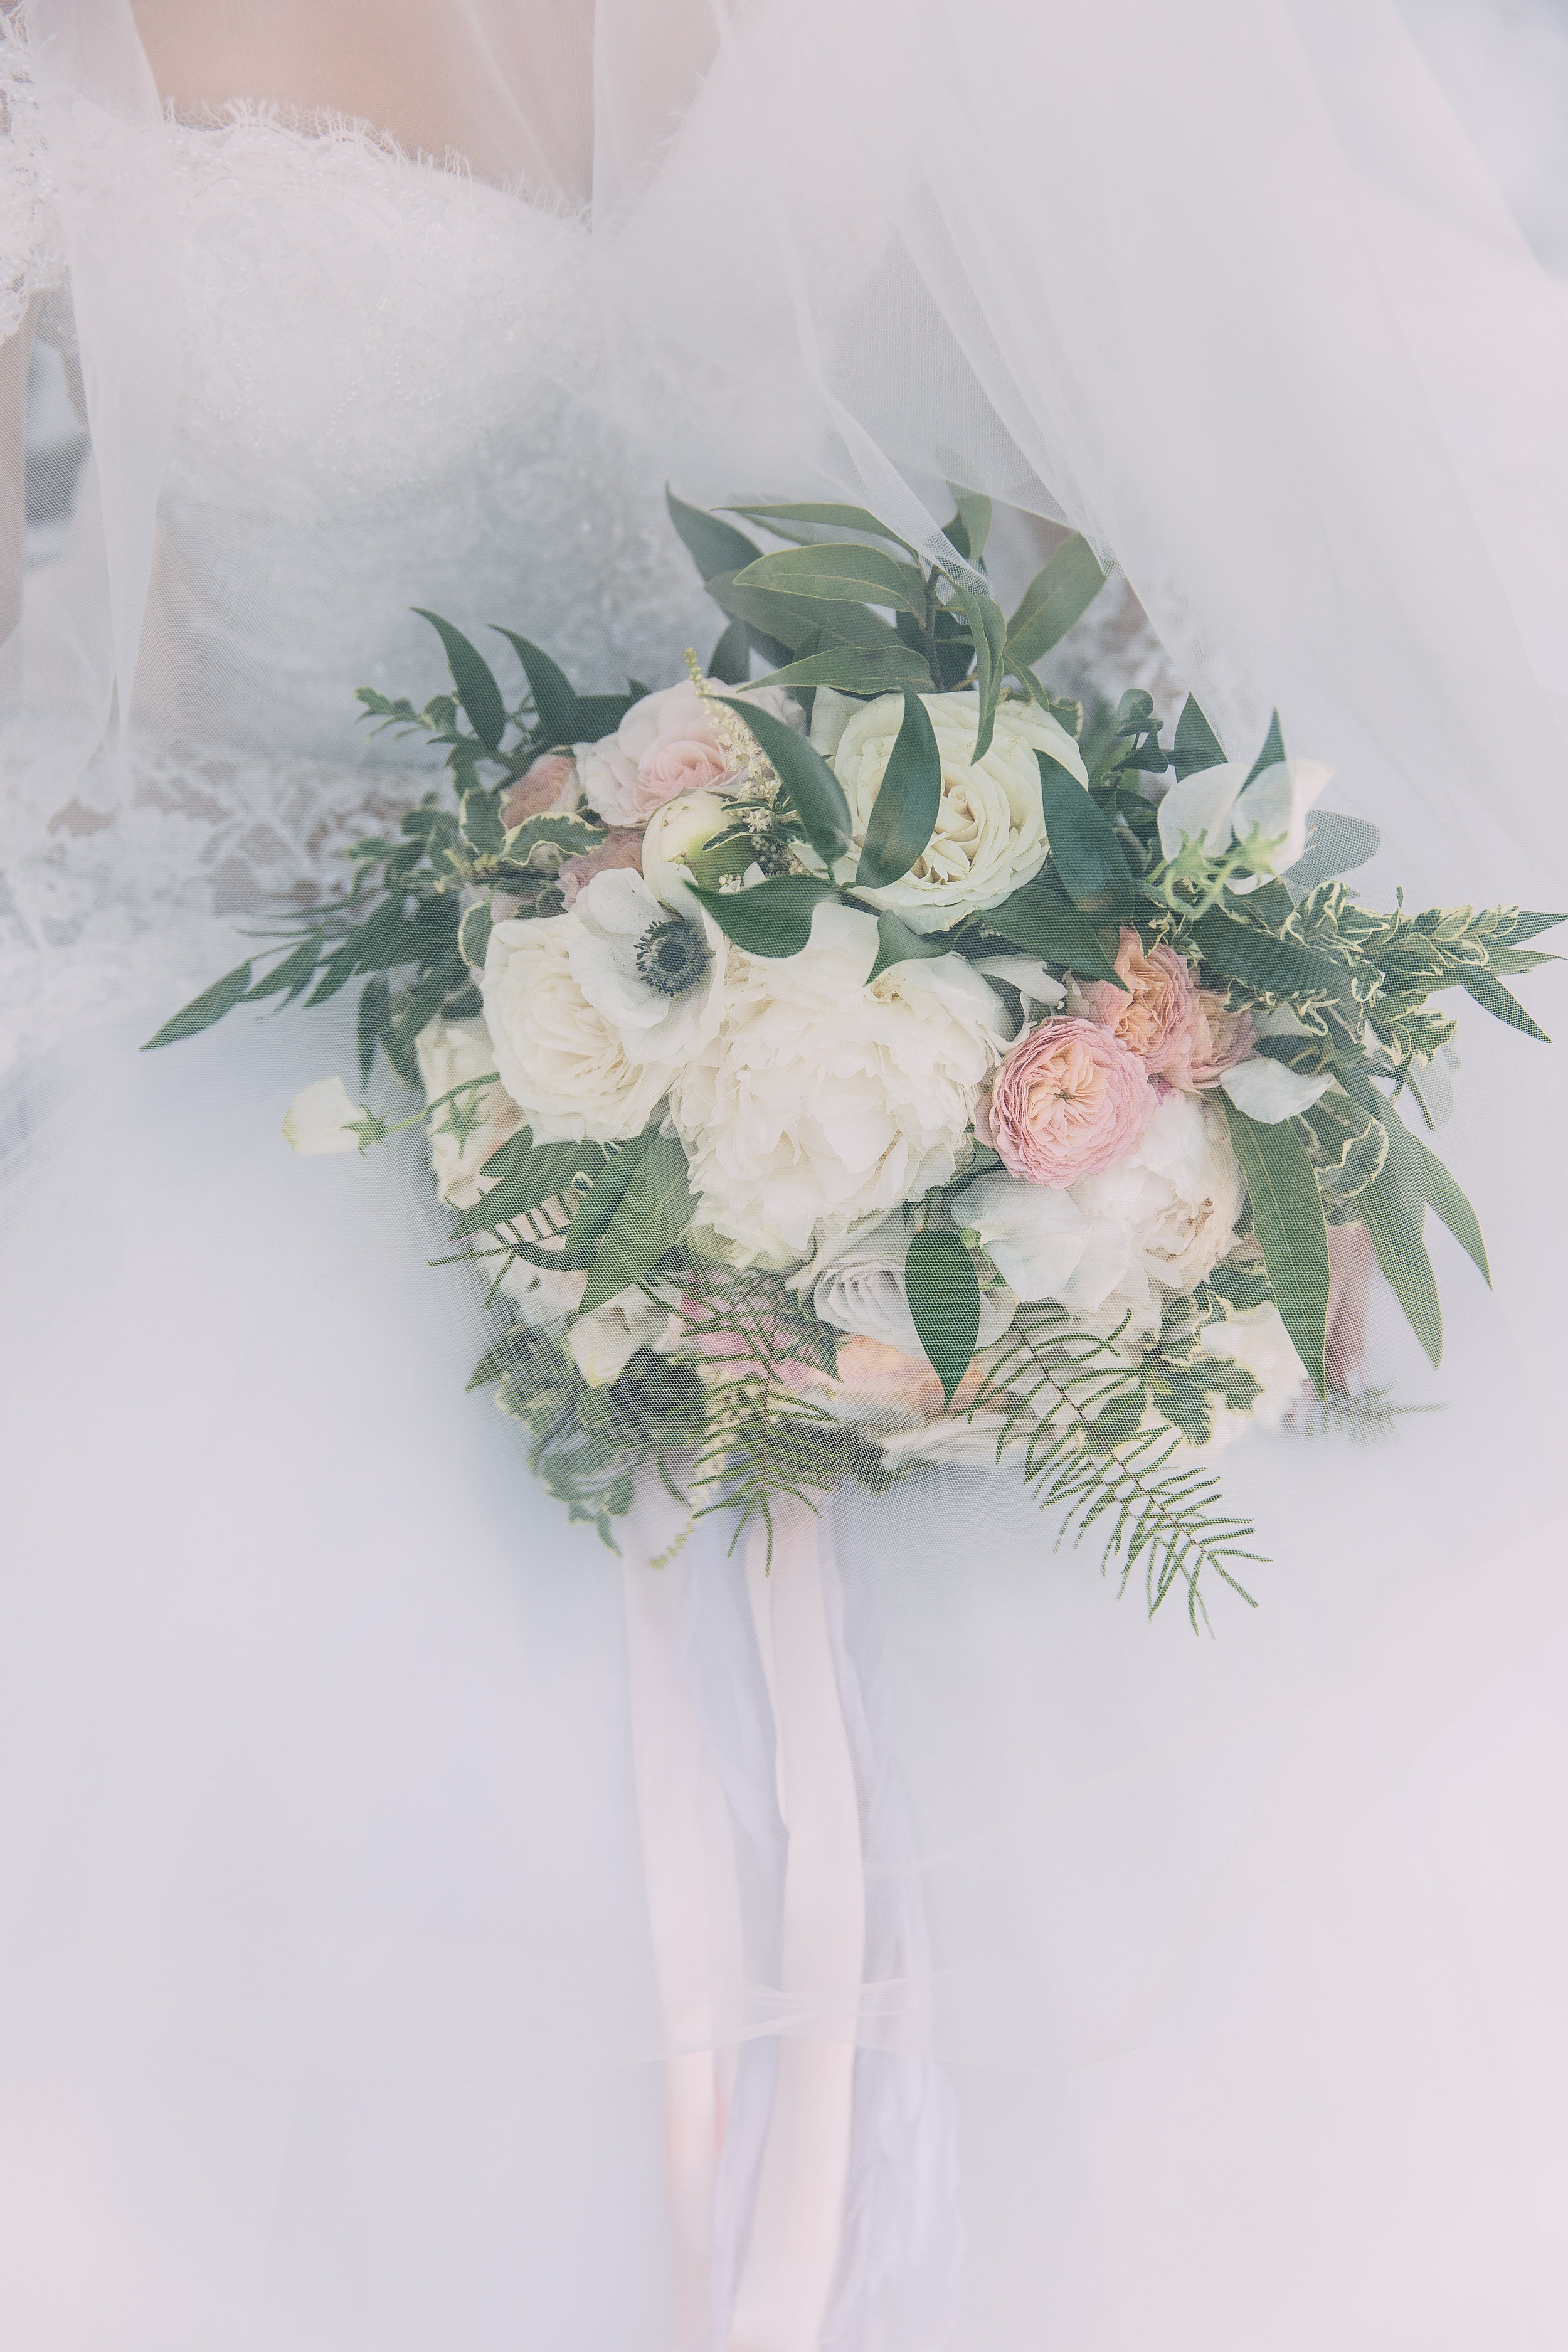 Violette-fleurs-anna-perevertaylo-White-Blush-elegant-flowers-for-wedding-decor-upscale-design-roseville-sacramento-california-rancho-robles-vinyards-lincoln-elegant-luxury-blush-bridal-bouquet-veil-photo.jpg